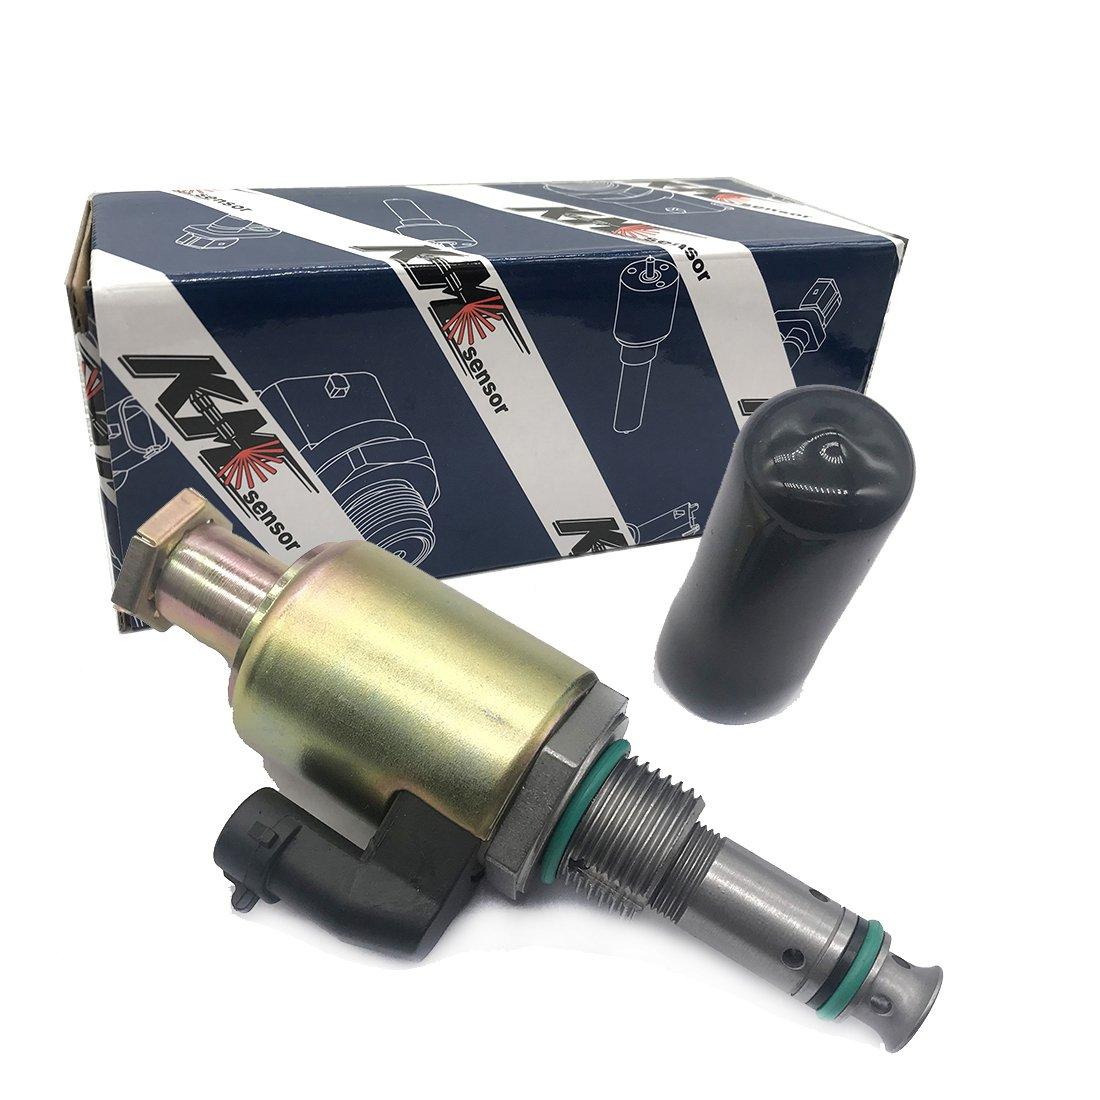 F81A9C968AA 1841086C91 F81Z9C968AB IPR Valve Injector Pressure Regulator Ford 7.3 Powerstroke